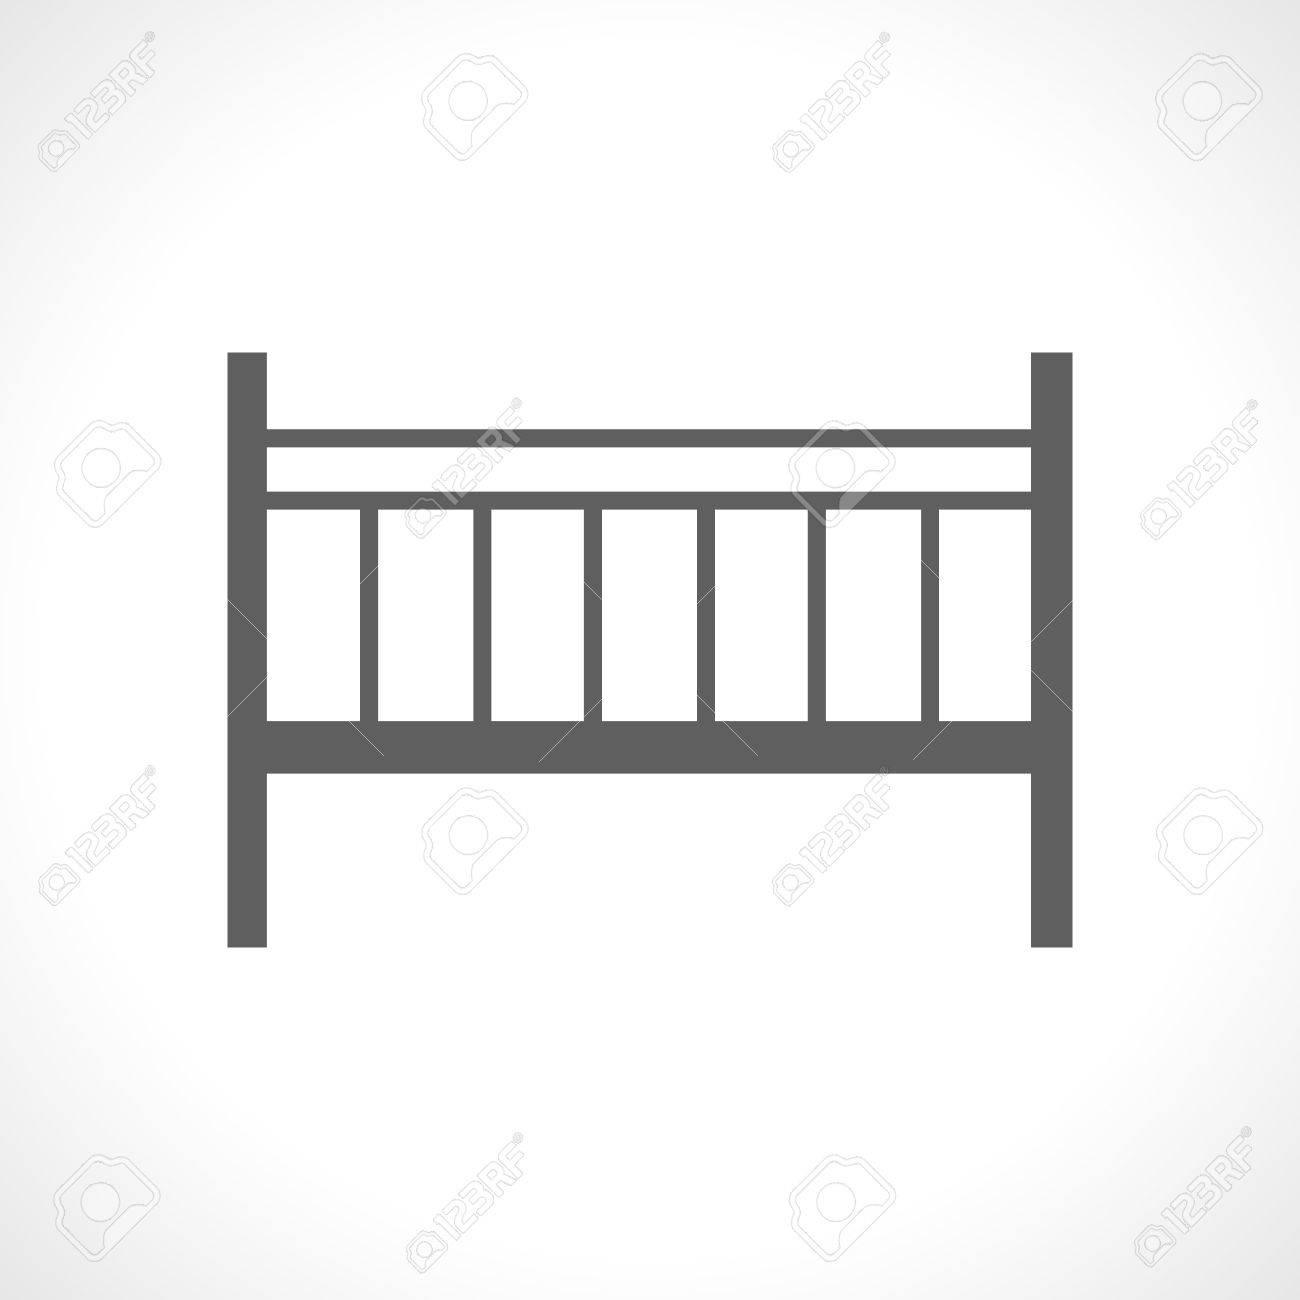 Cuna Icono Aislado Sobre Fondo Blanco. Cama Plegable Portátil ...